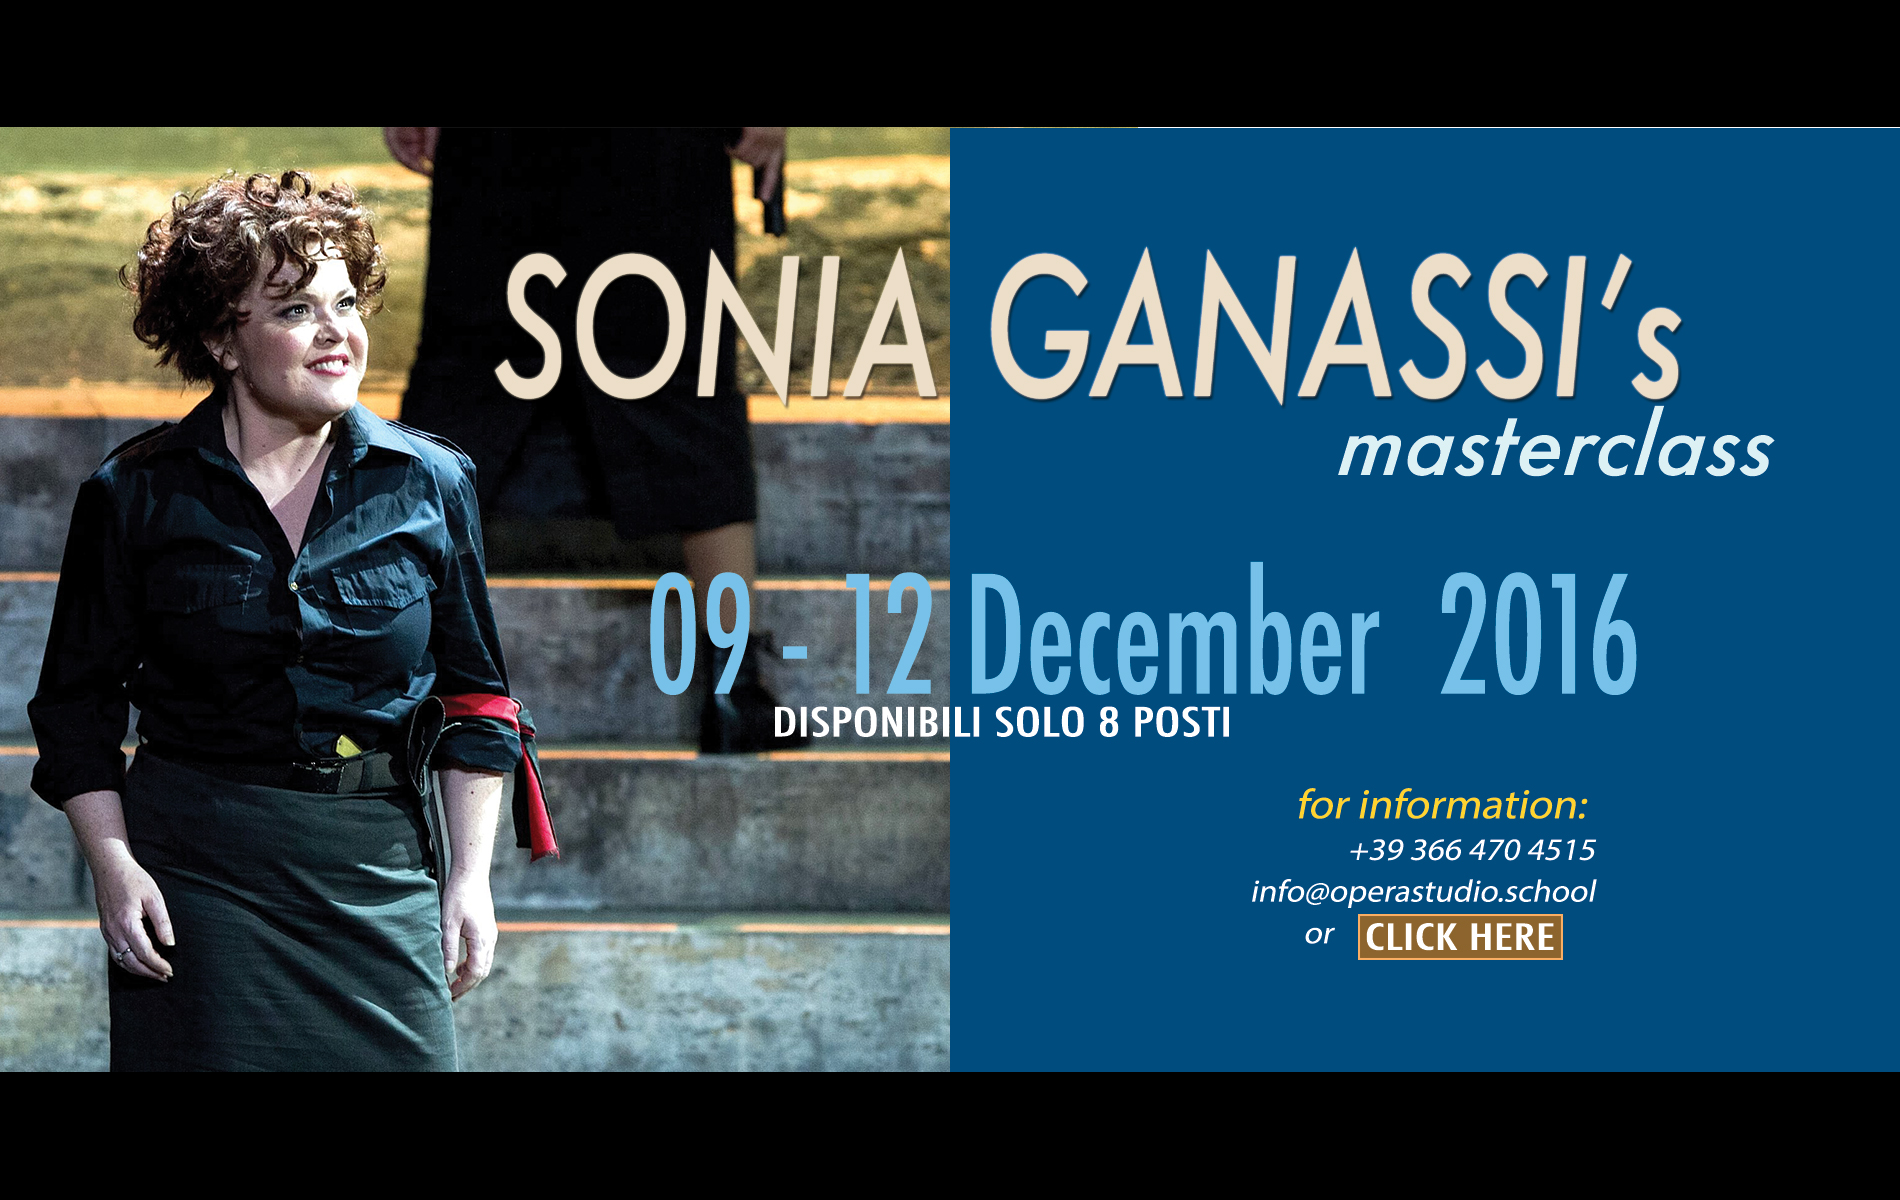 sonia-ganassi-december-2016